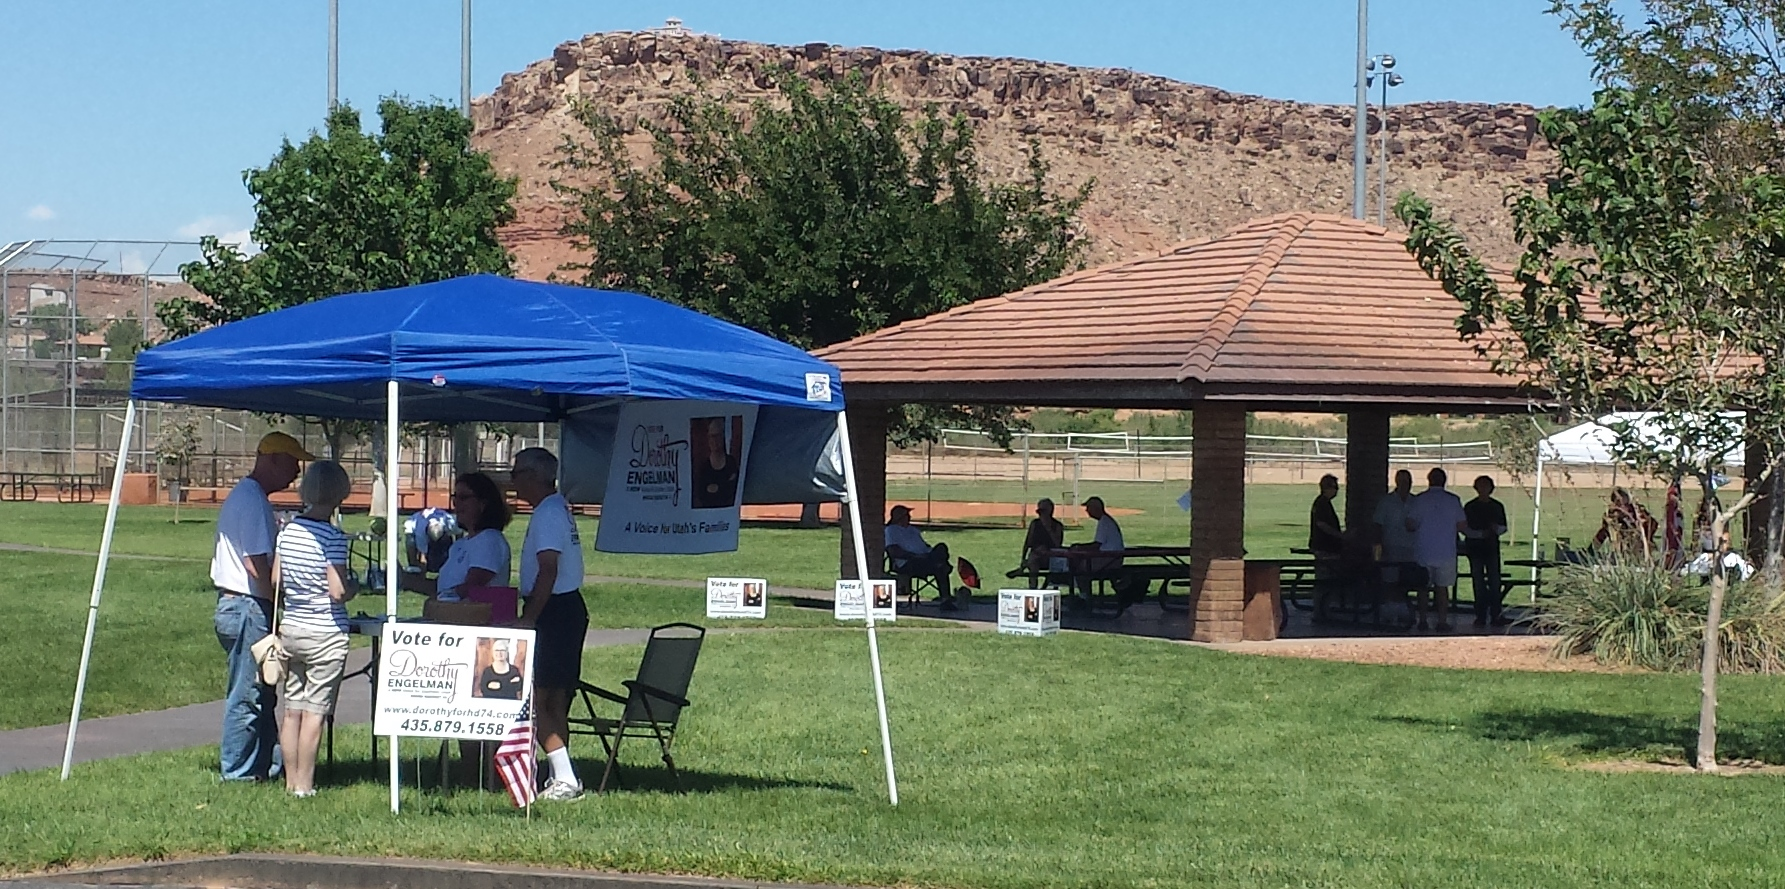 Dorothy Engelman campaign kickoff. Bloomington Park, St. George, Utah. Sept 6, 2014 | Photo by T.S Romney St. George News